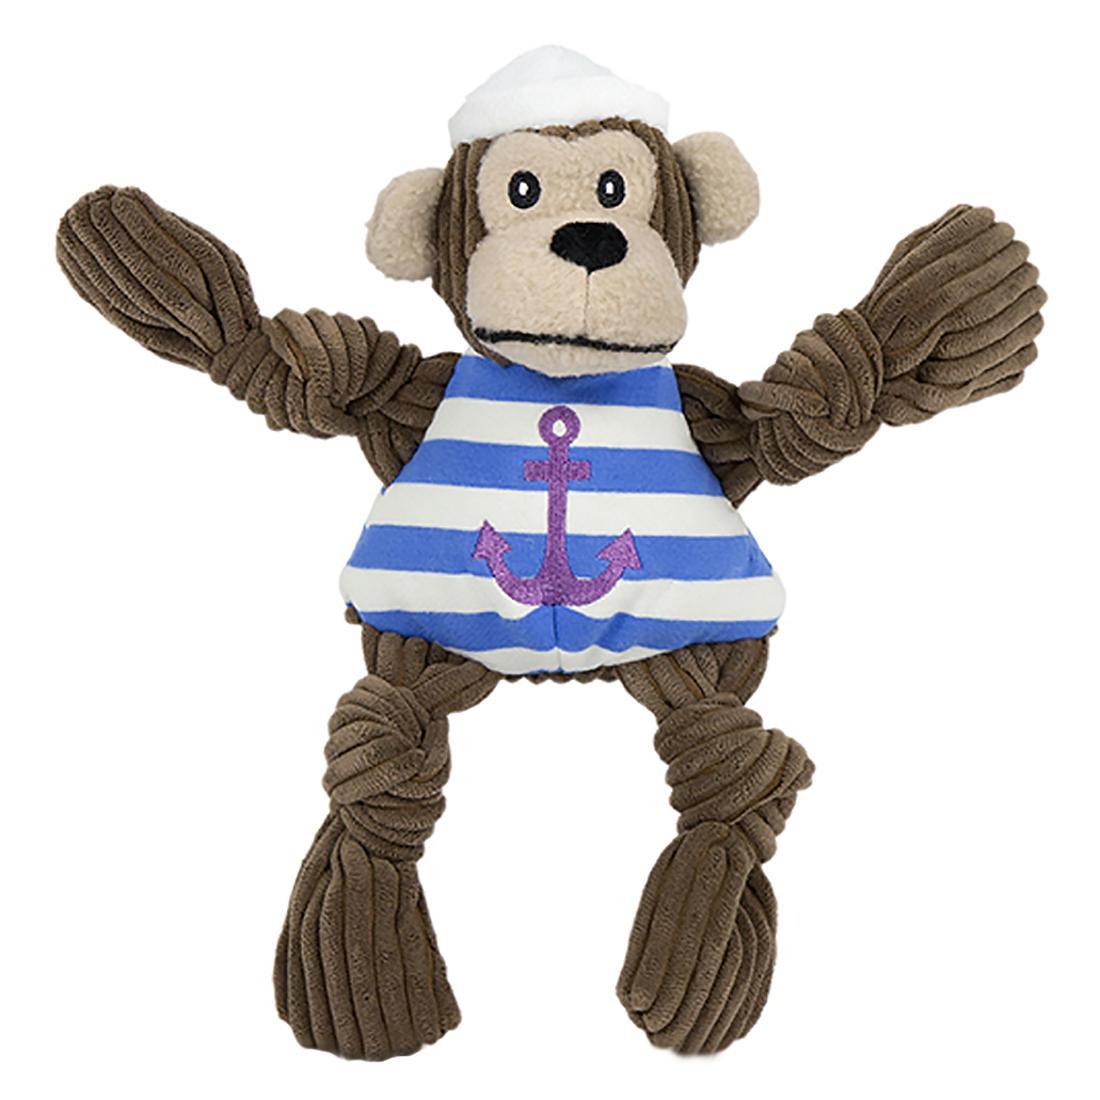 HuggleHounds Knotties Dog Toy - Sailor Chimp